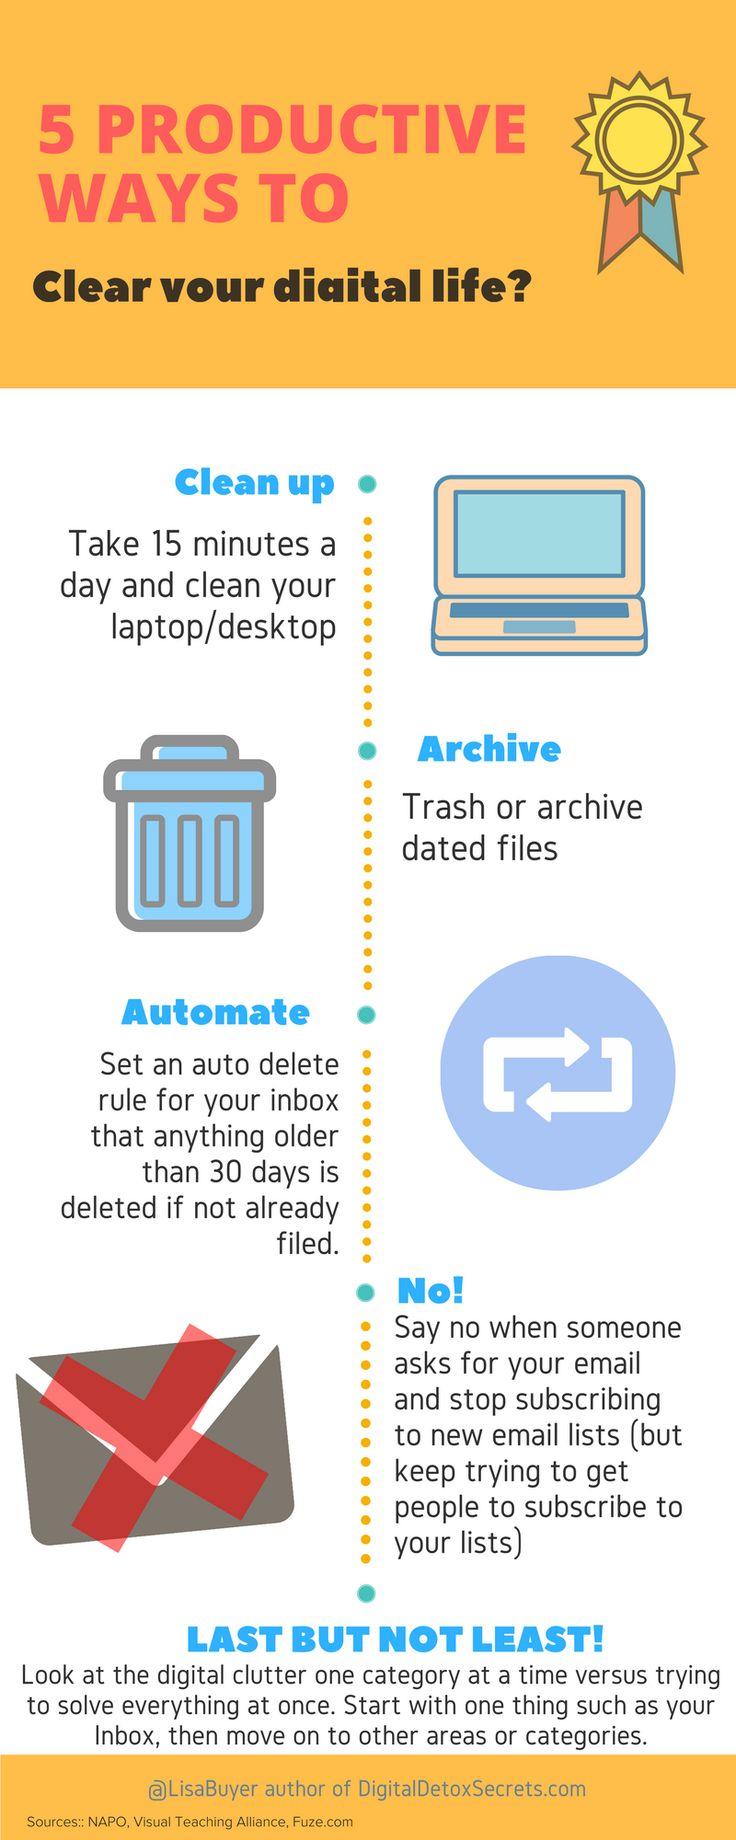 5+ Awesome Ways to Declutter Your Digital Marketing Life. [Infographic] @sejournal @lisabuyer #declutter #organize #digitalmarketing